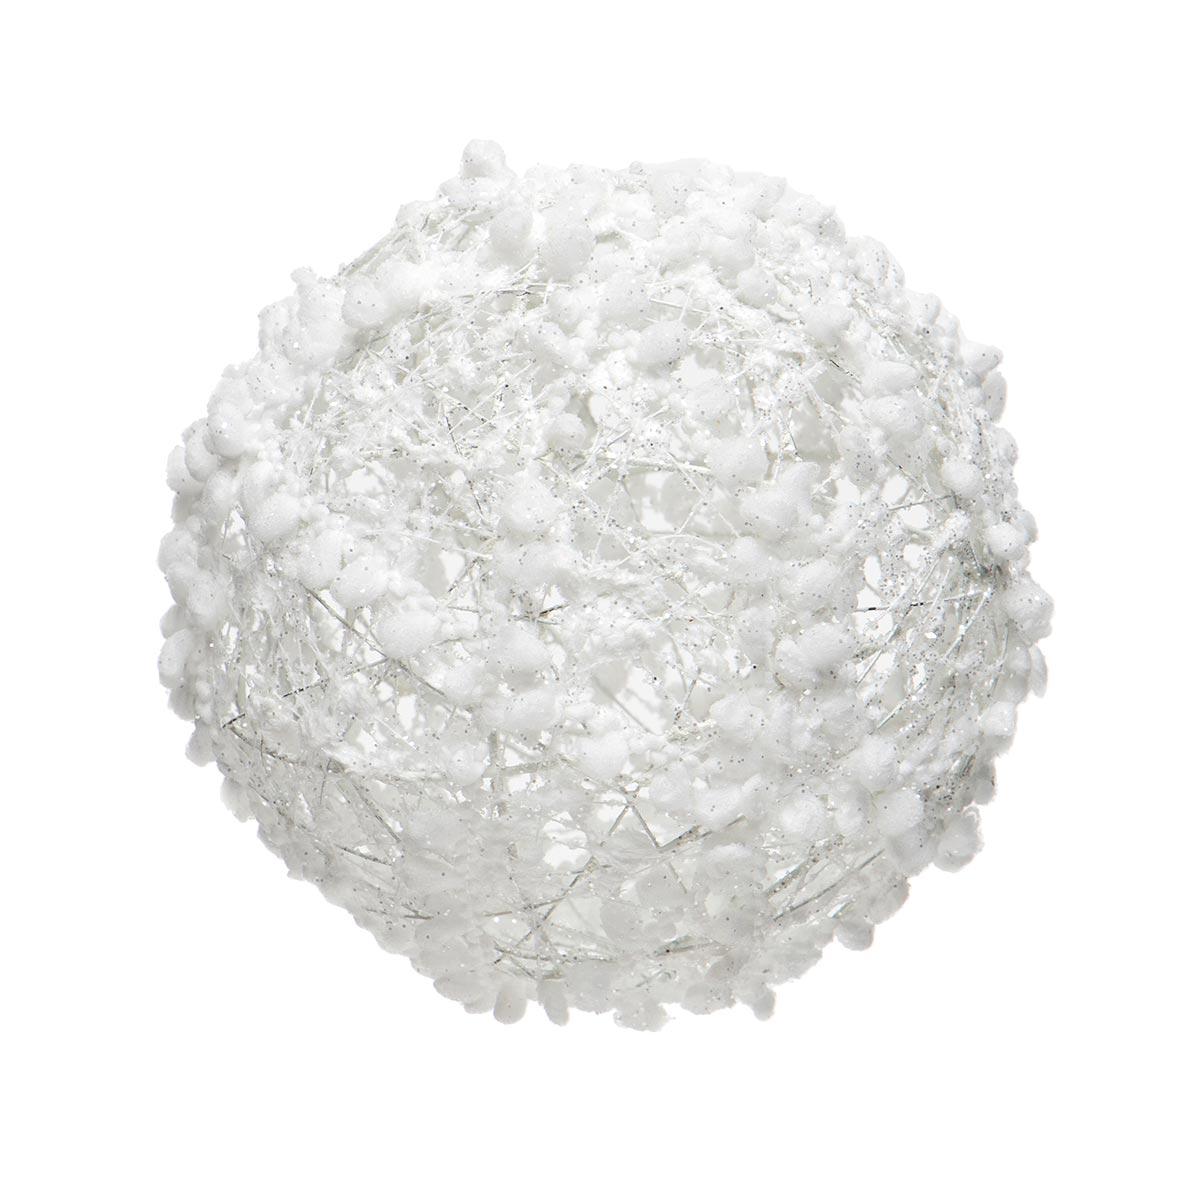 WHITE PUFF BALL ORNAMENT WITH GLITTER